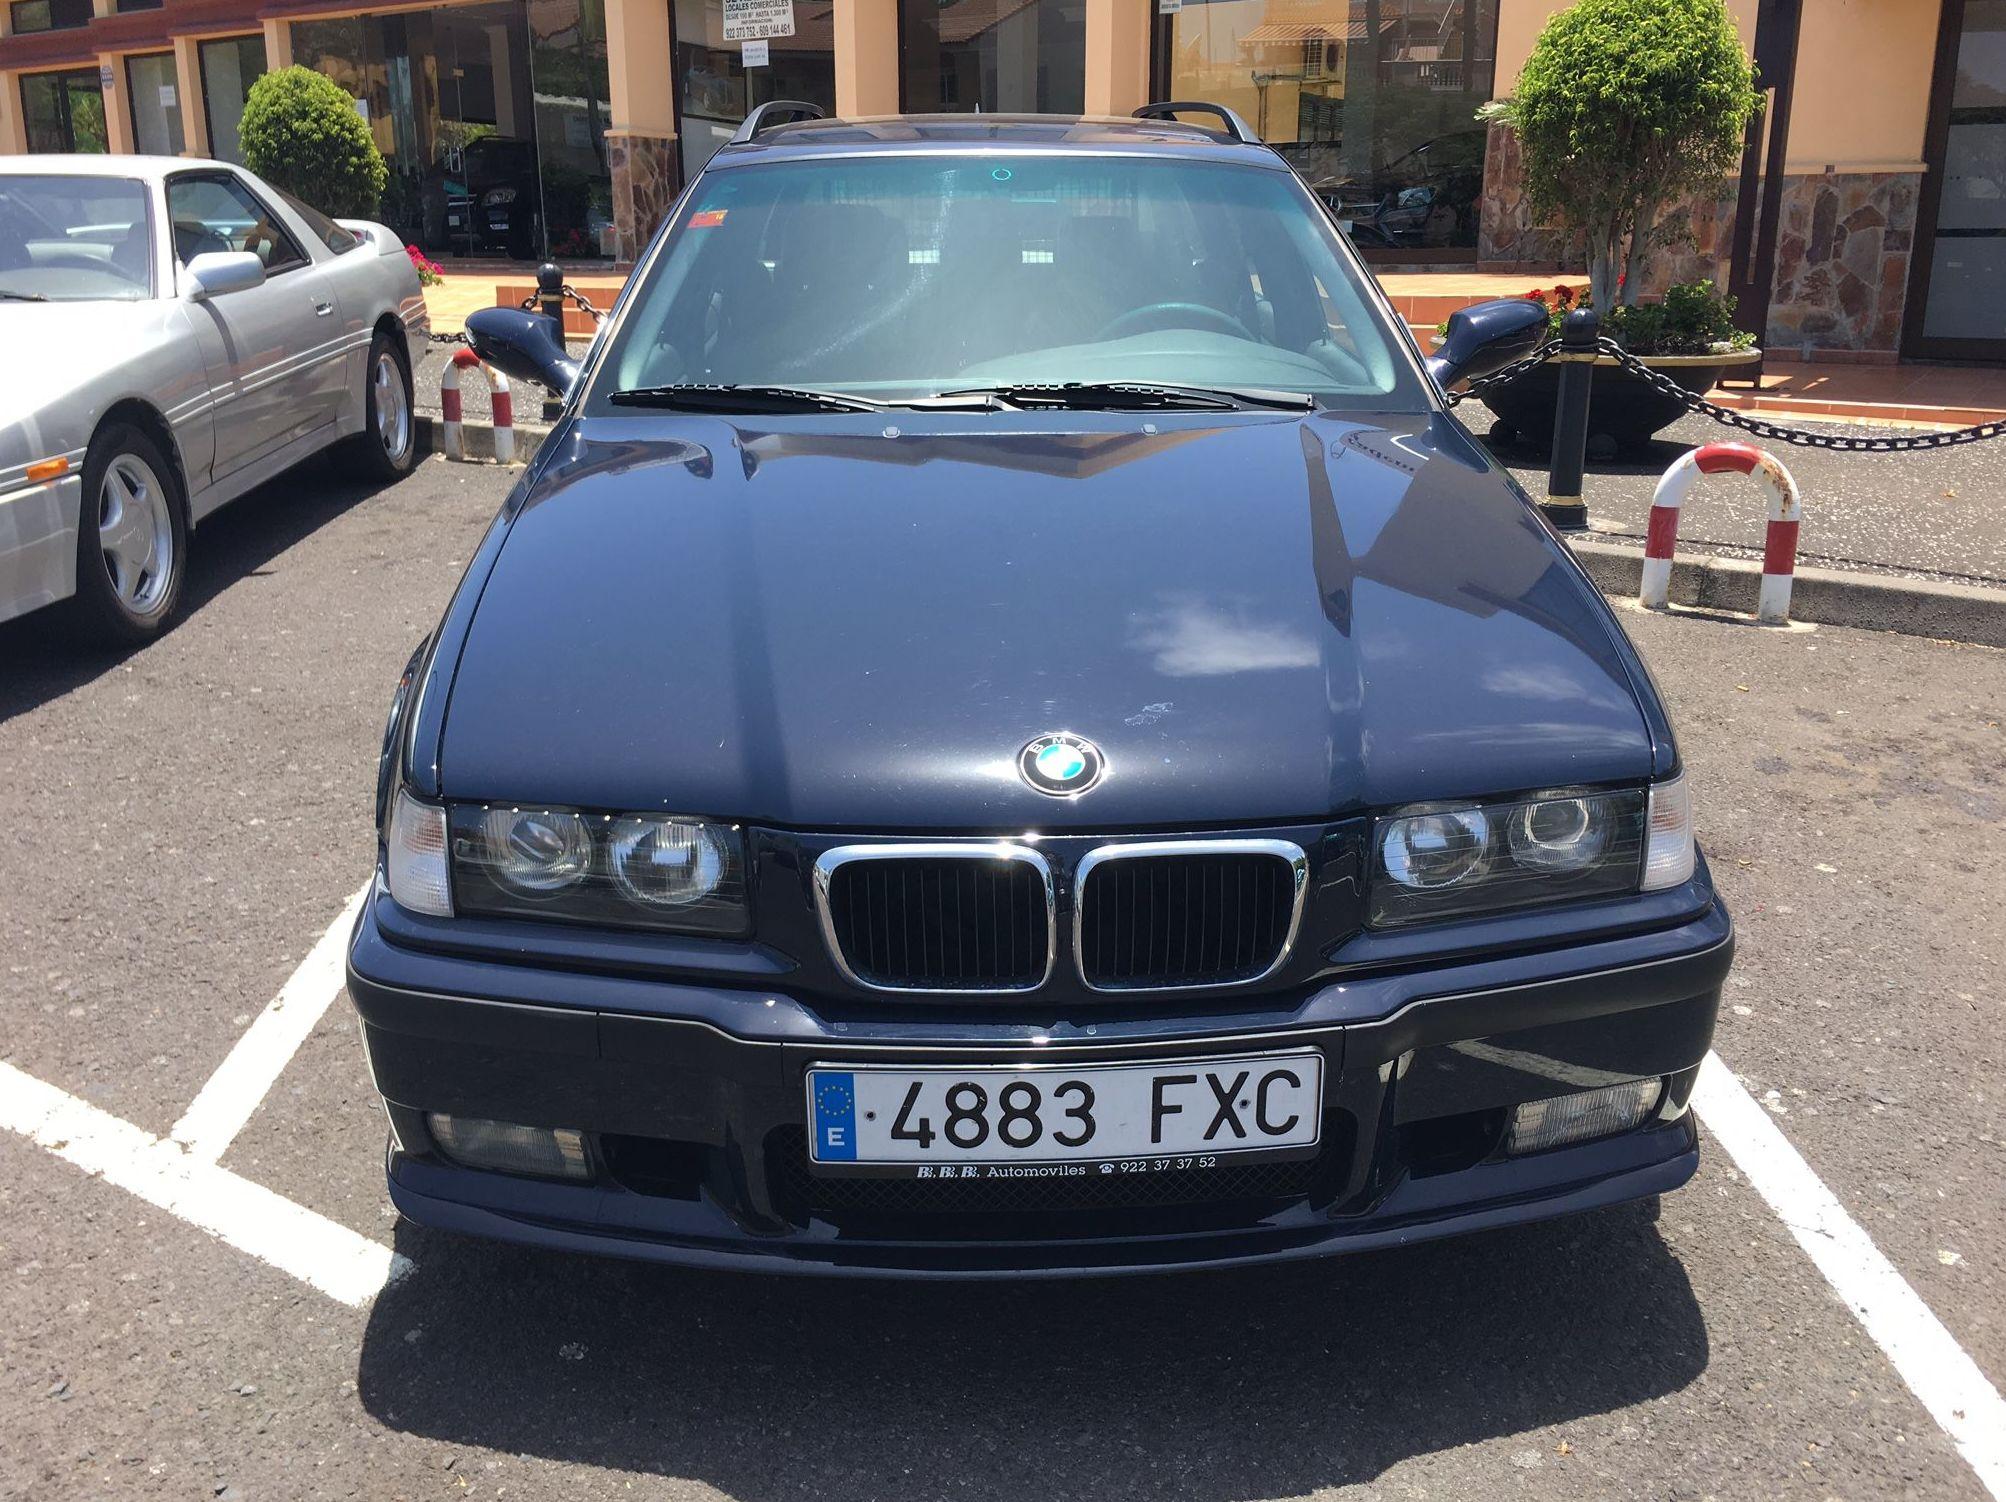 BMW 320I TOURING: Coches de B.B.B. Automóviles